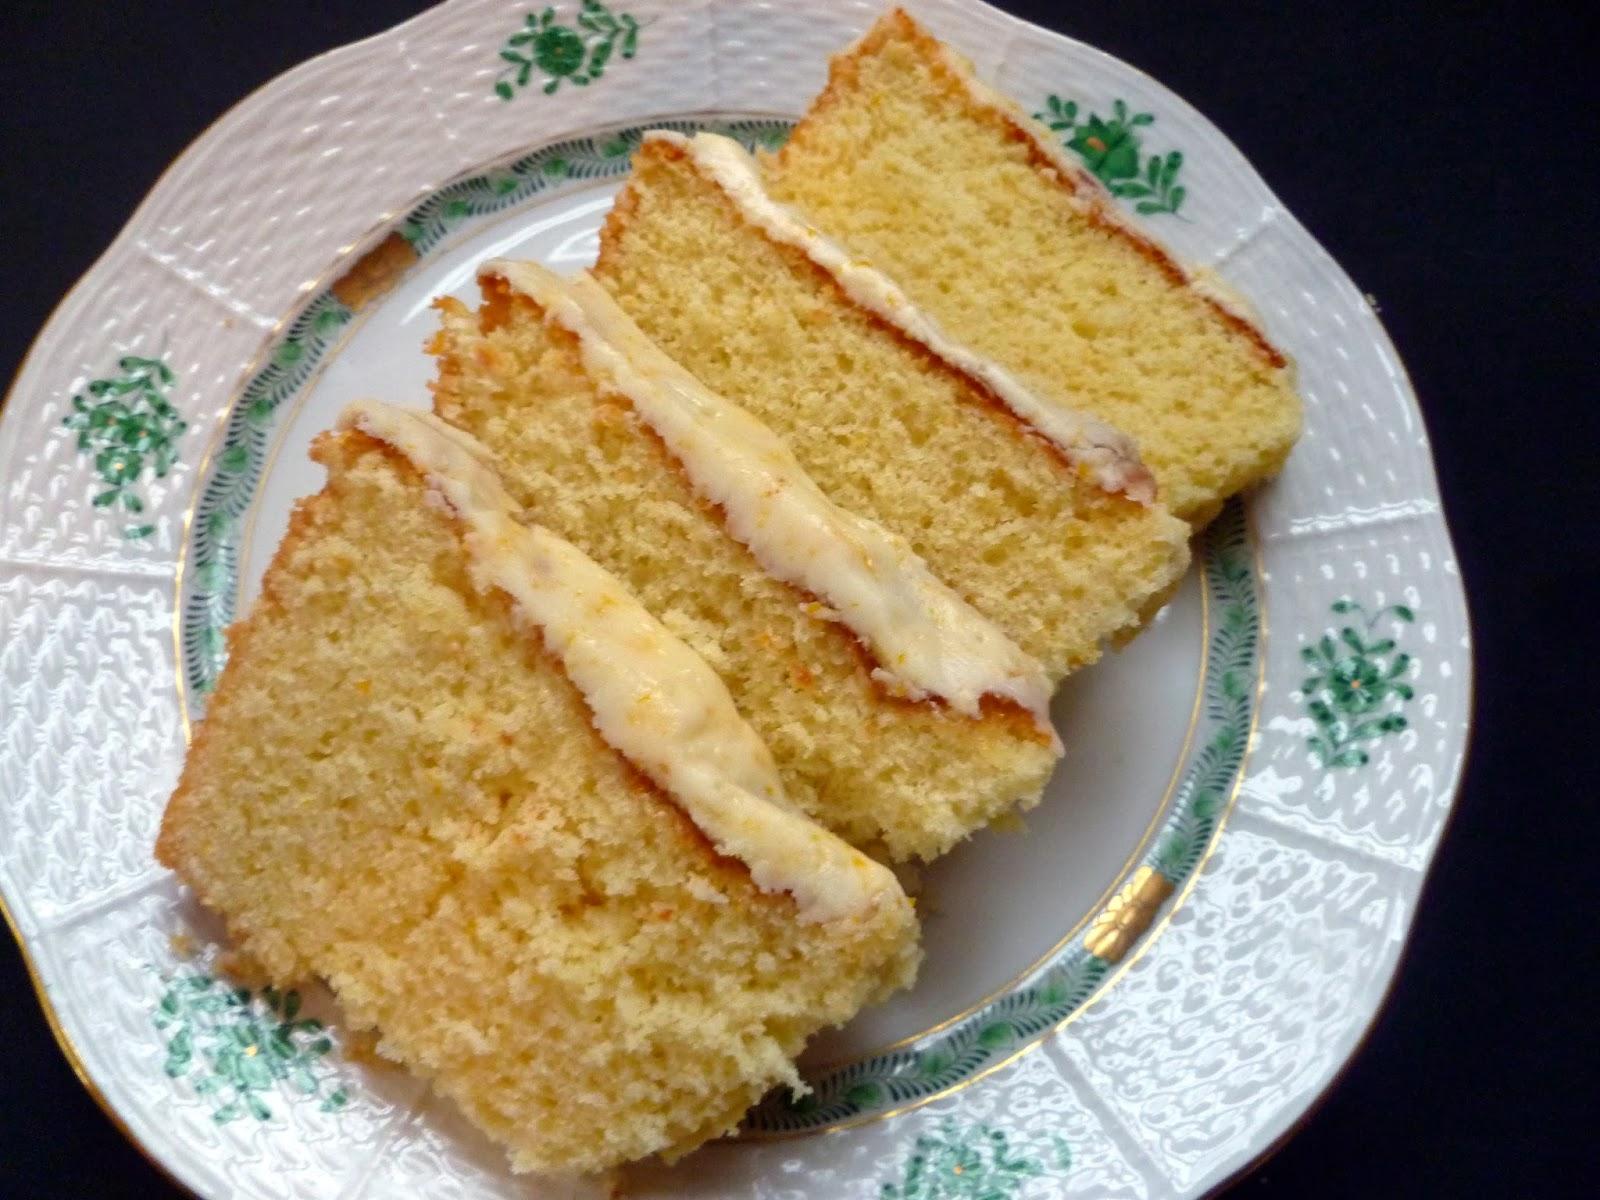 Lindaraxa: Meyer Lemon Pound Cake With Glaze